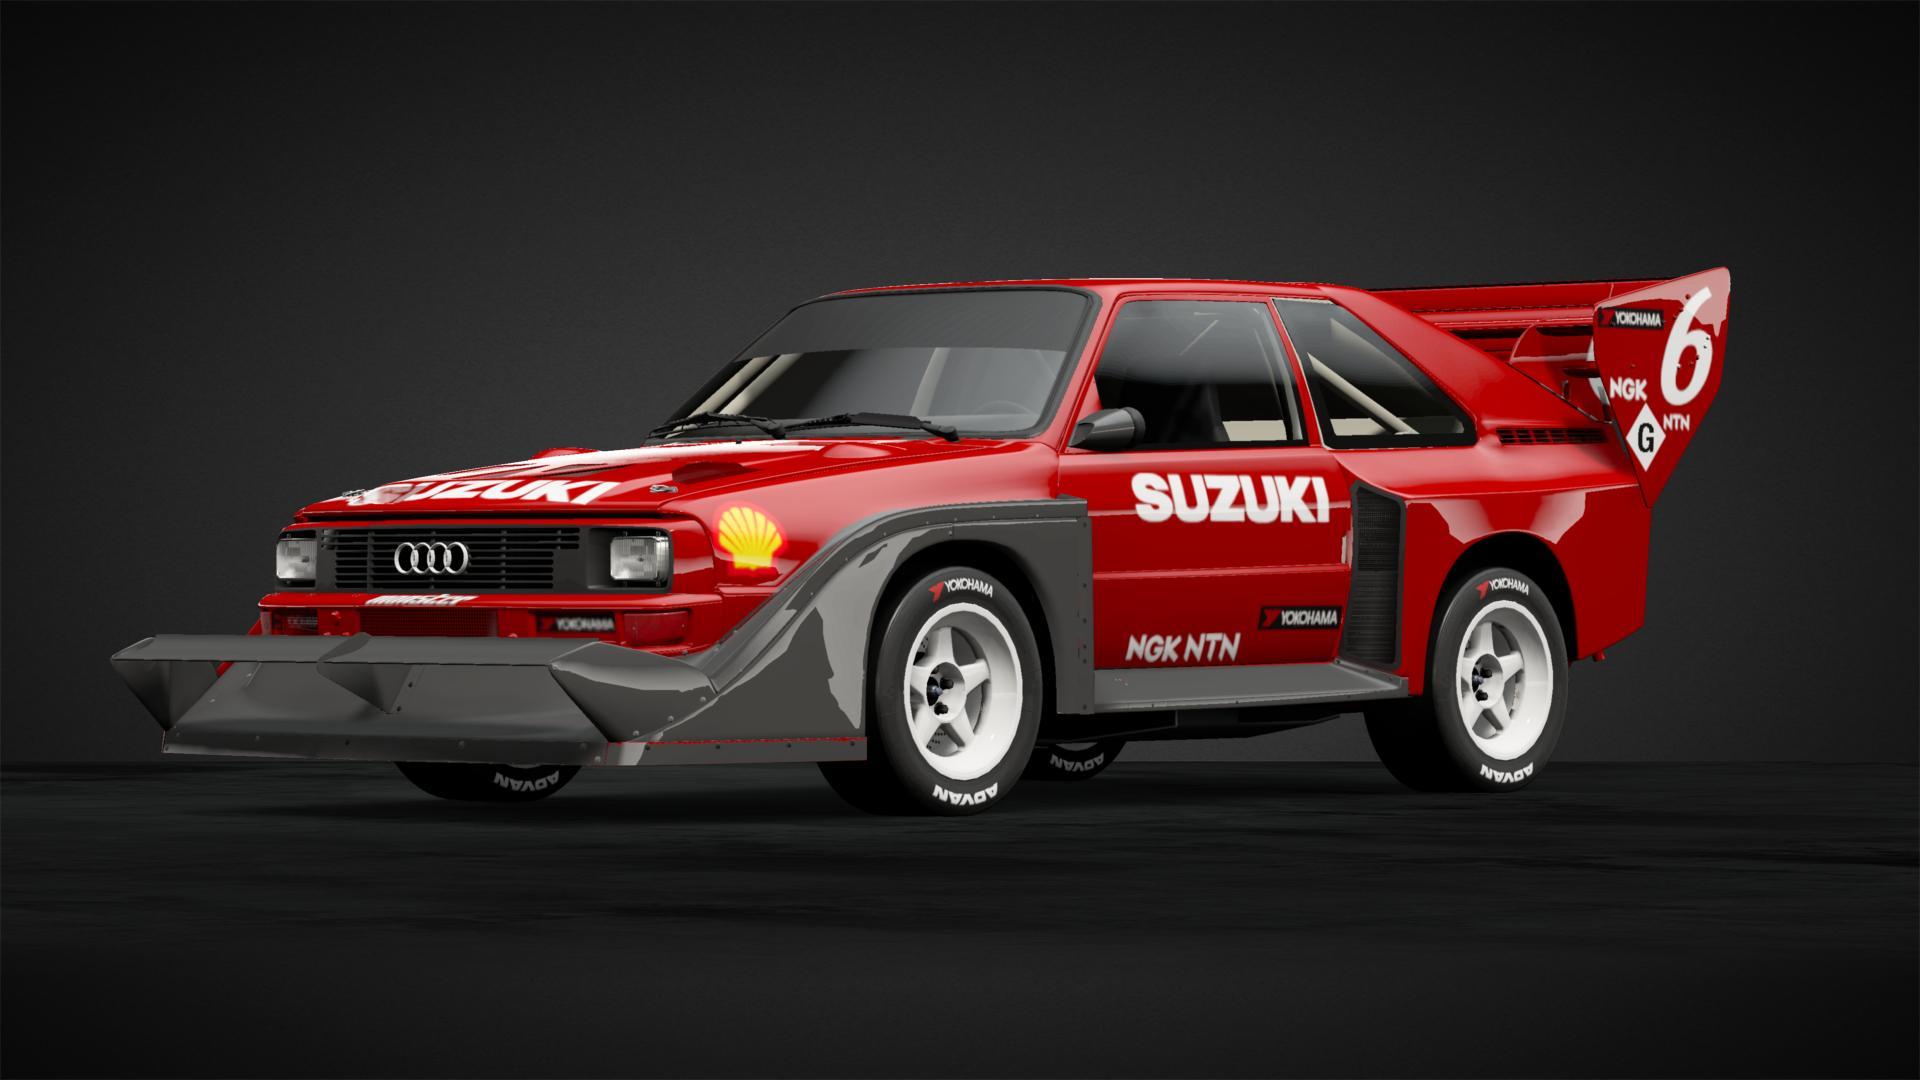 hight resolution of suzuki escudo dirt trial car car livery by rogholmespne1880 community gran turismo sport